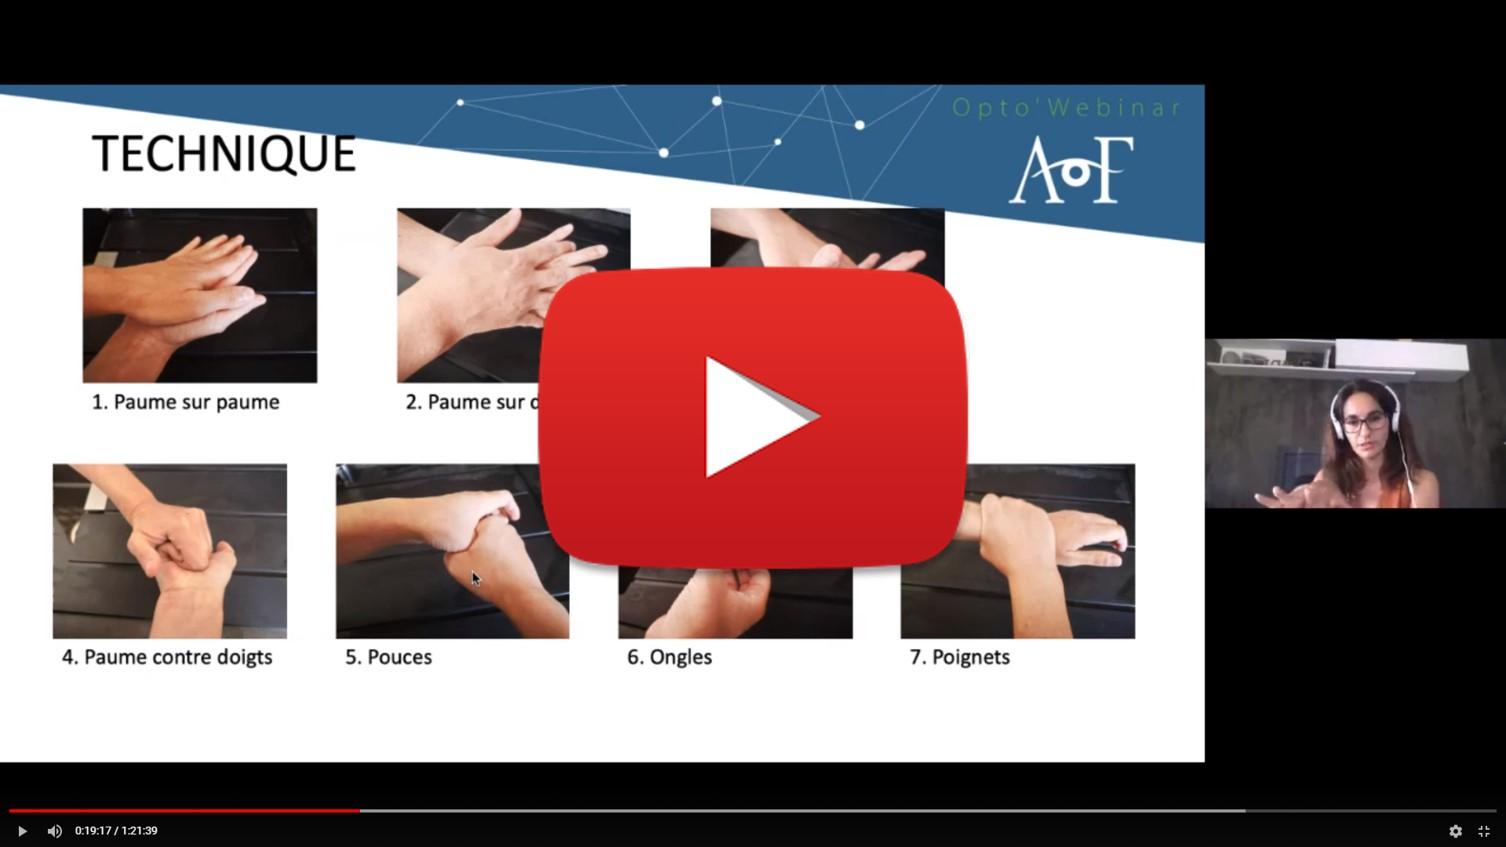 | WEBINAR Hygiène et Covid-19, apprenez les bons gestes |